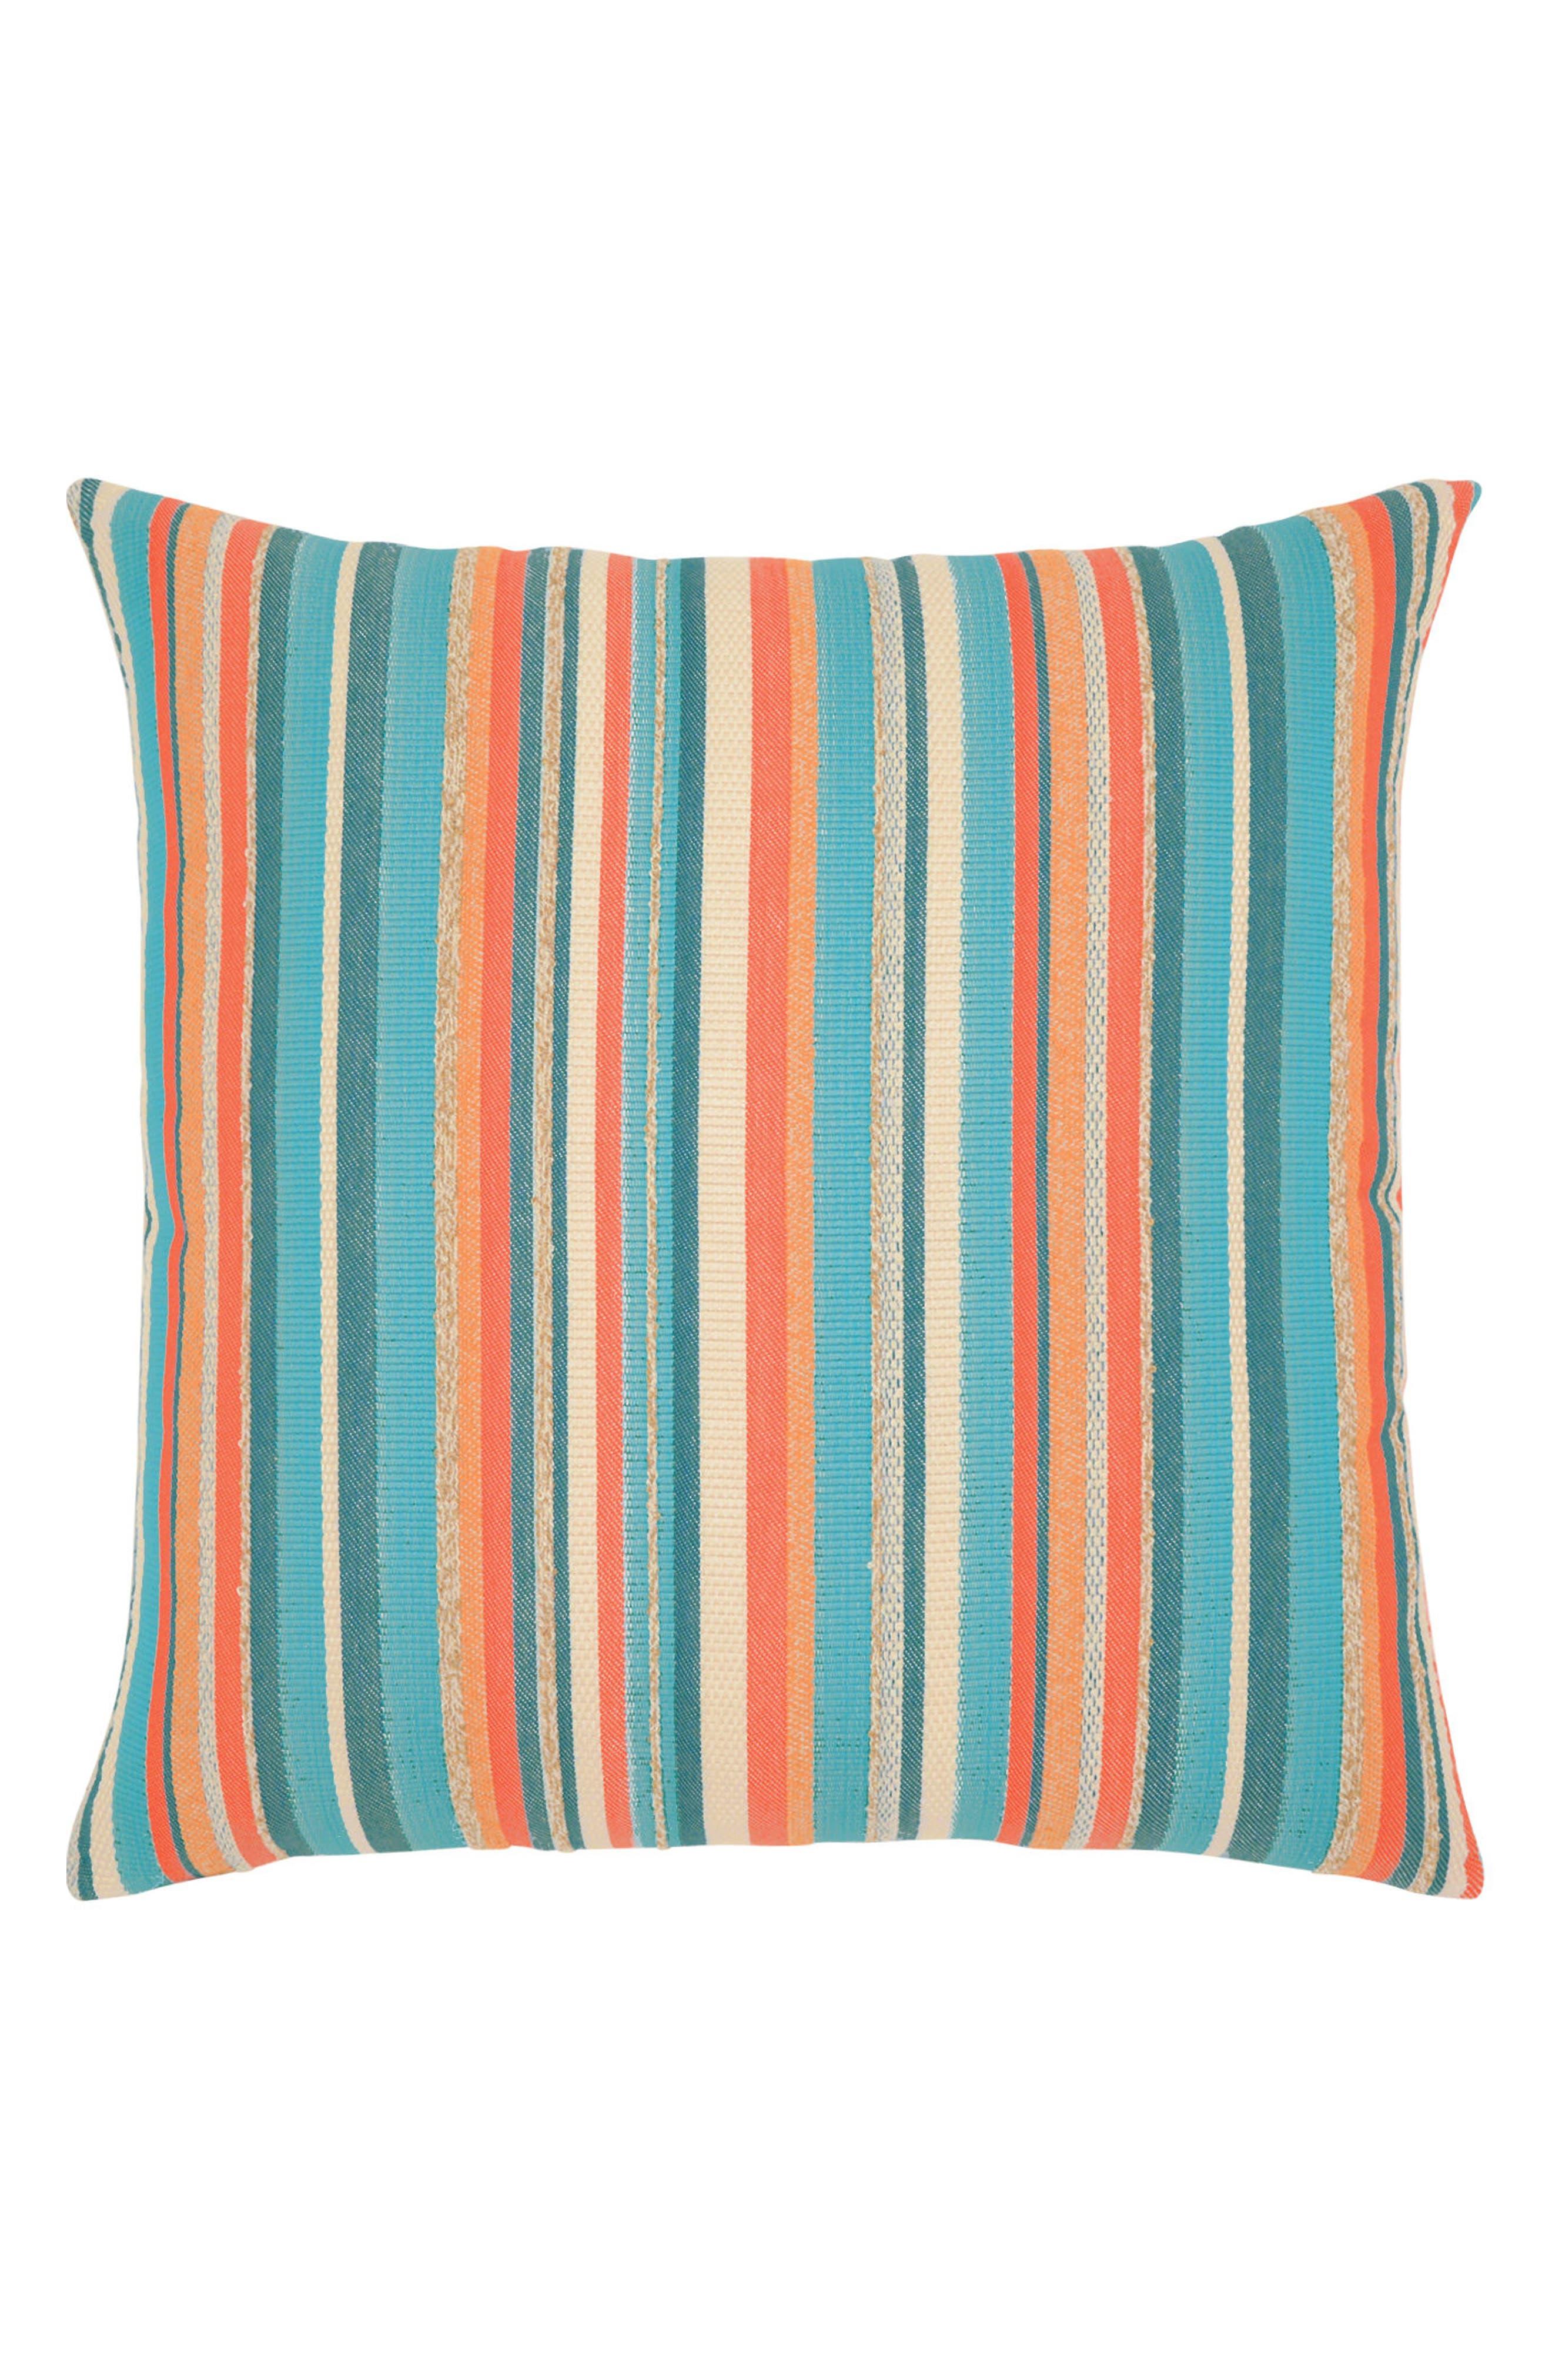 Grand Turk Stripe Indoor/Outdoor Accent Pillow,                         Main,                         color, Blue/ Orange